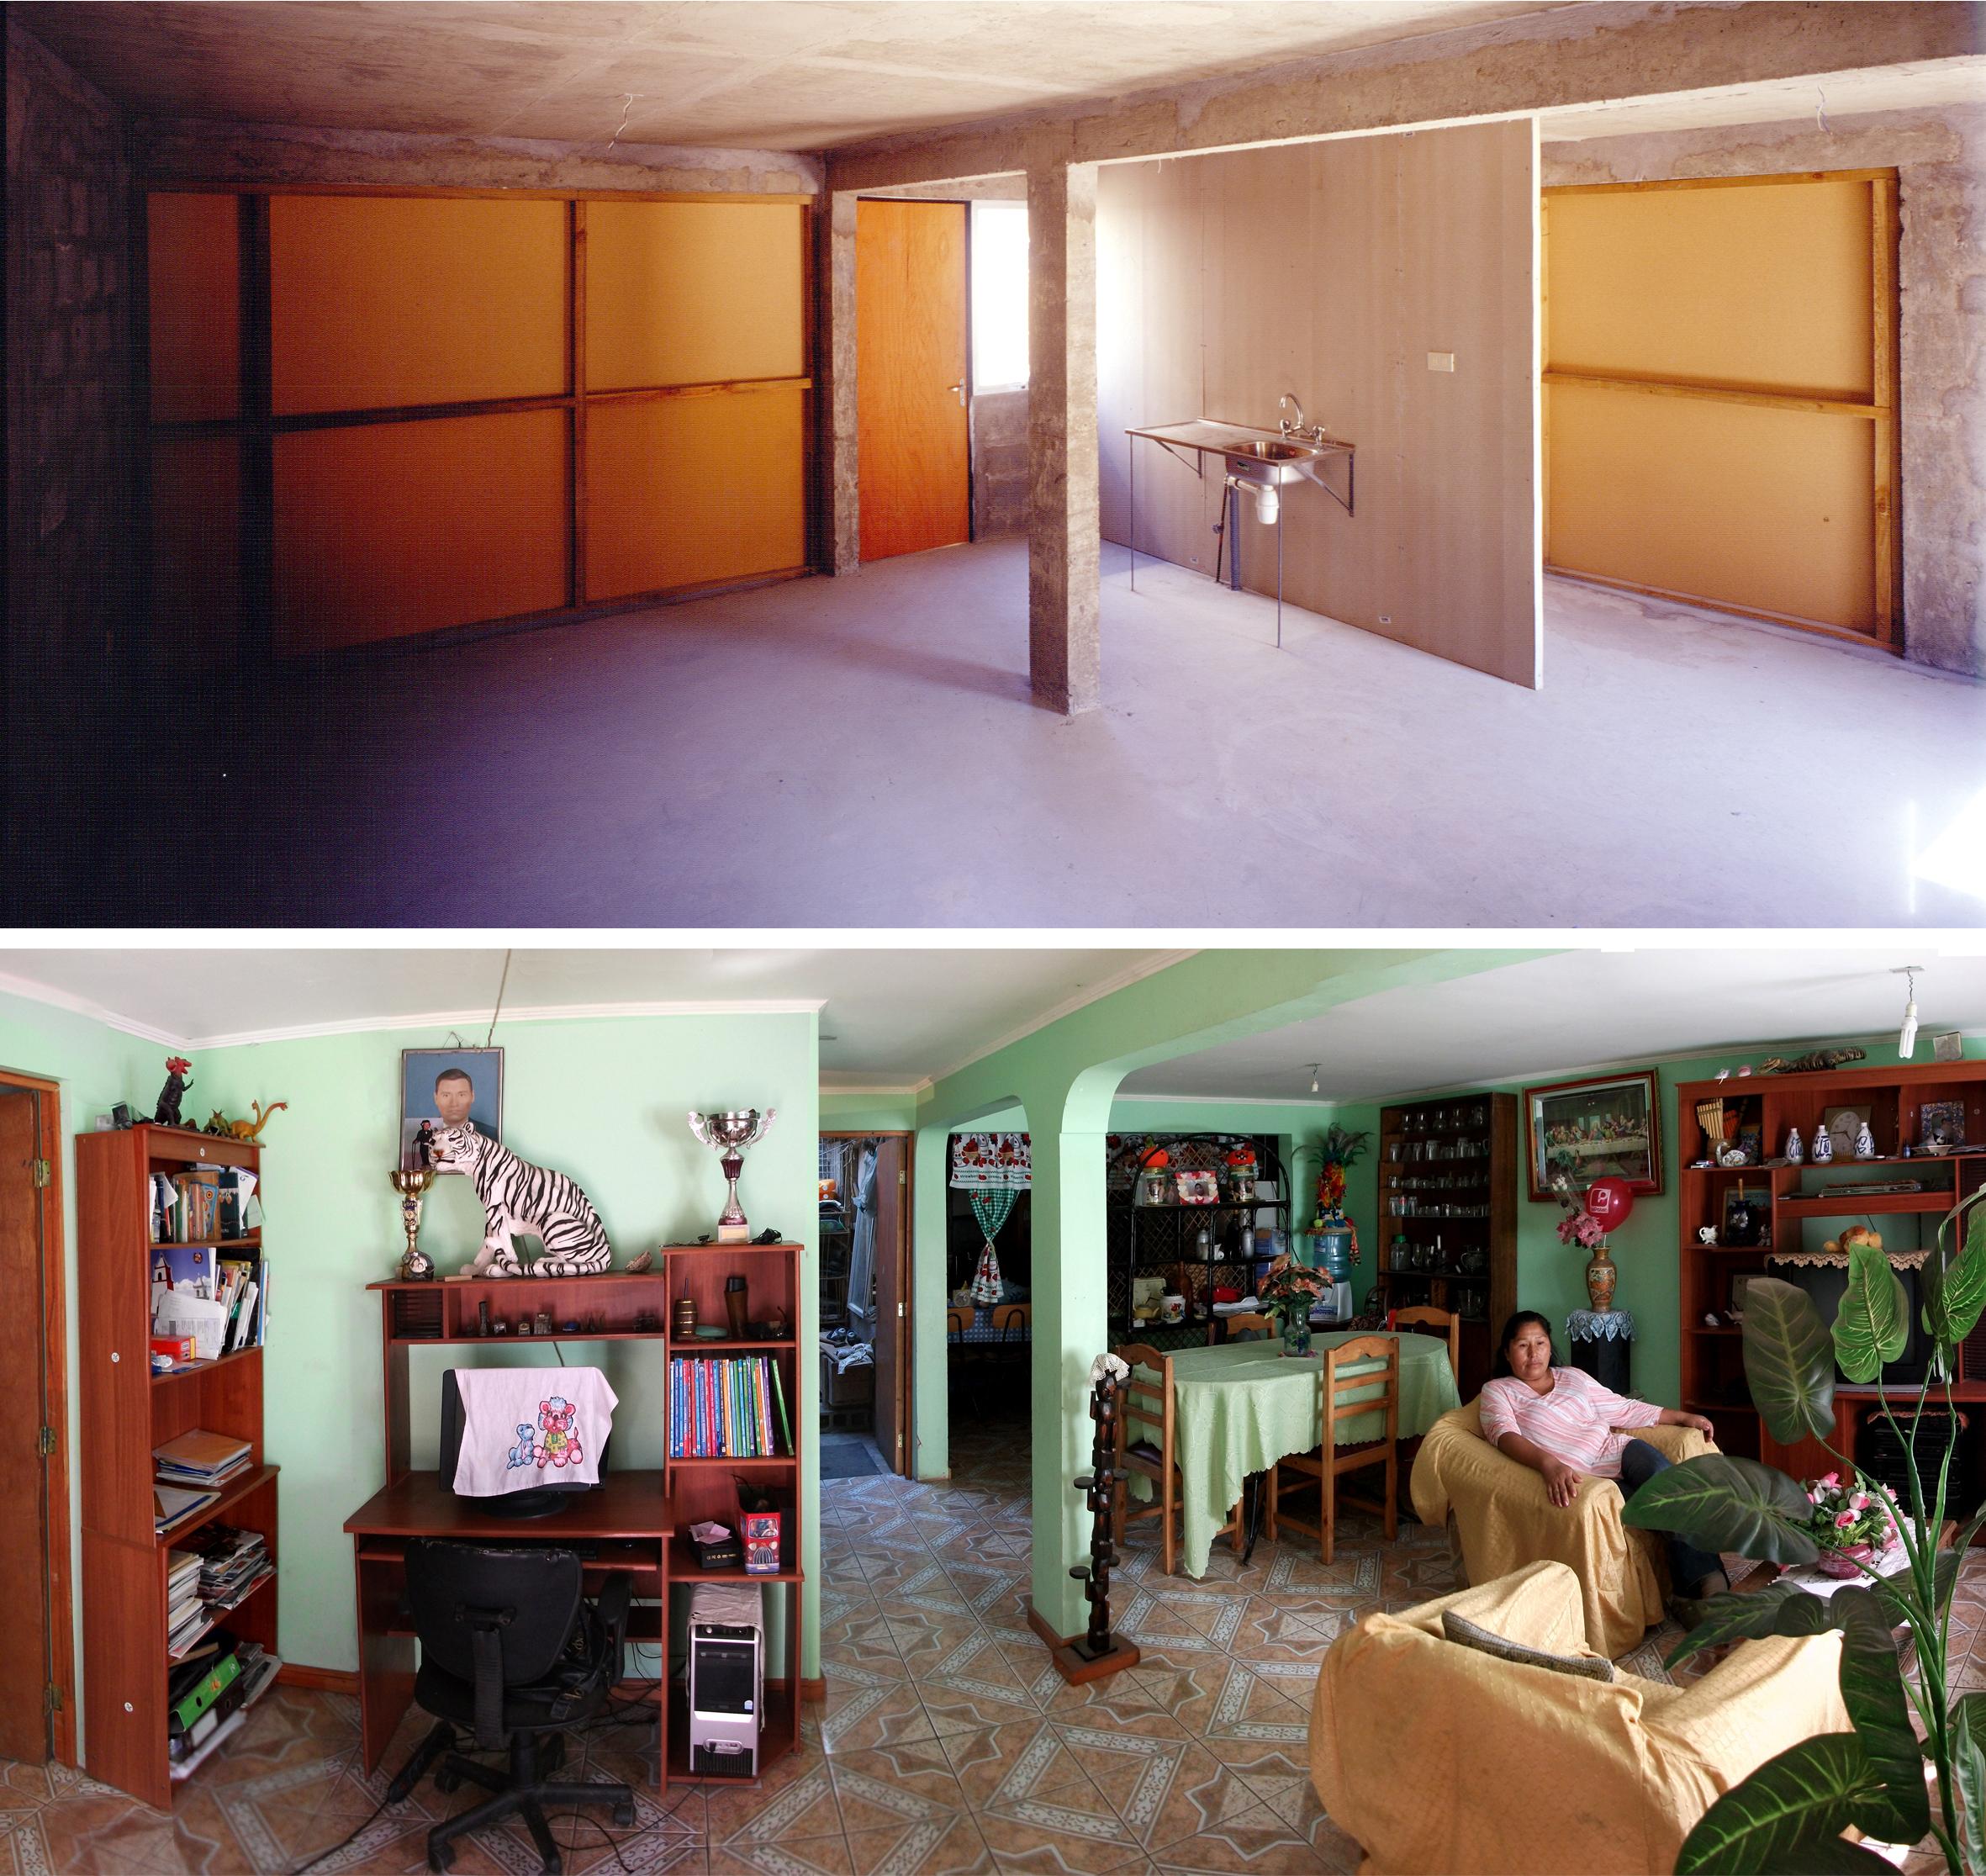 Quinta Monroy Housing, 2004, Iquique, Chile.